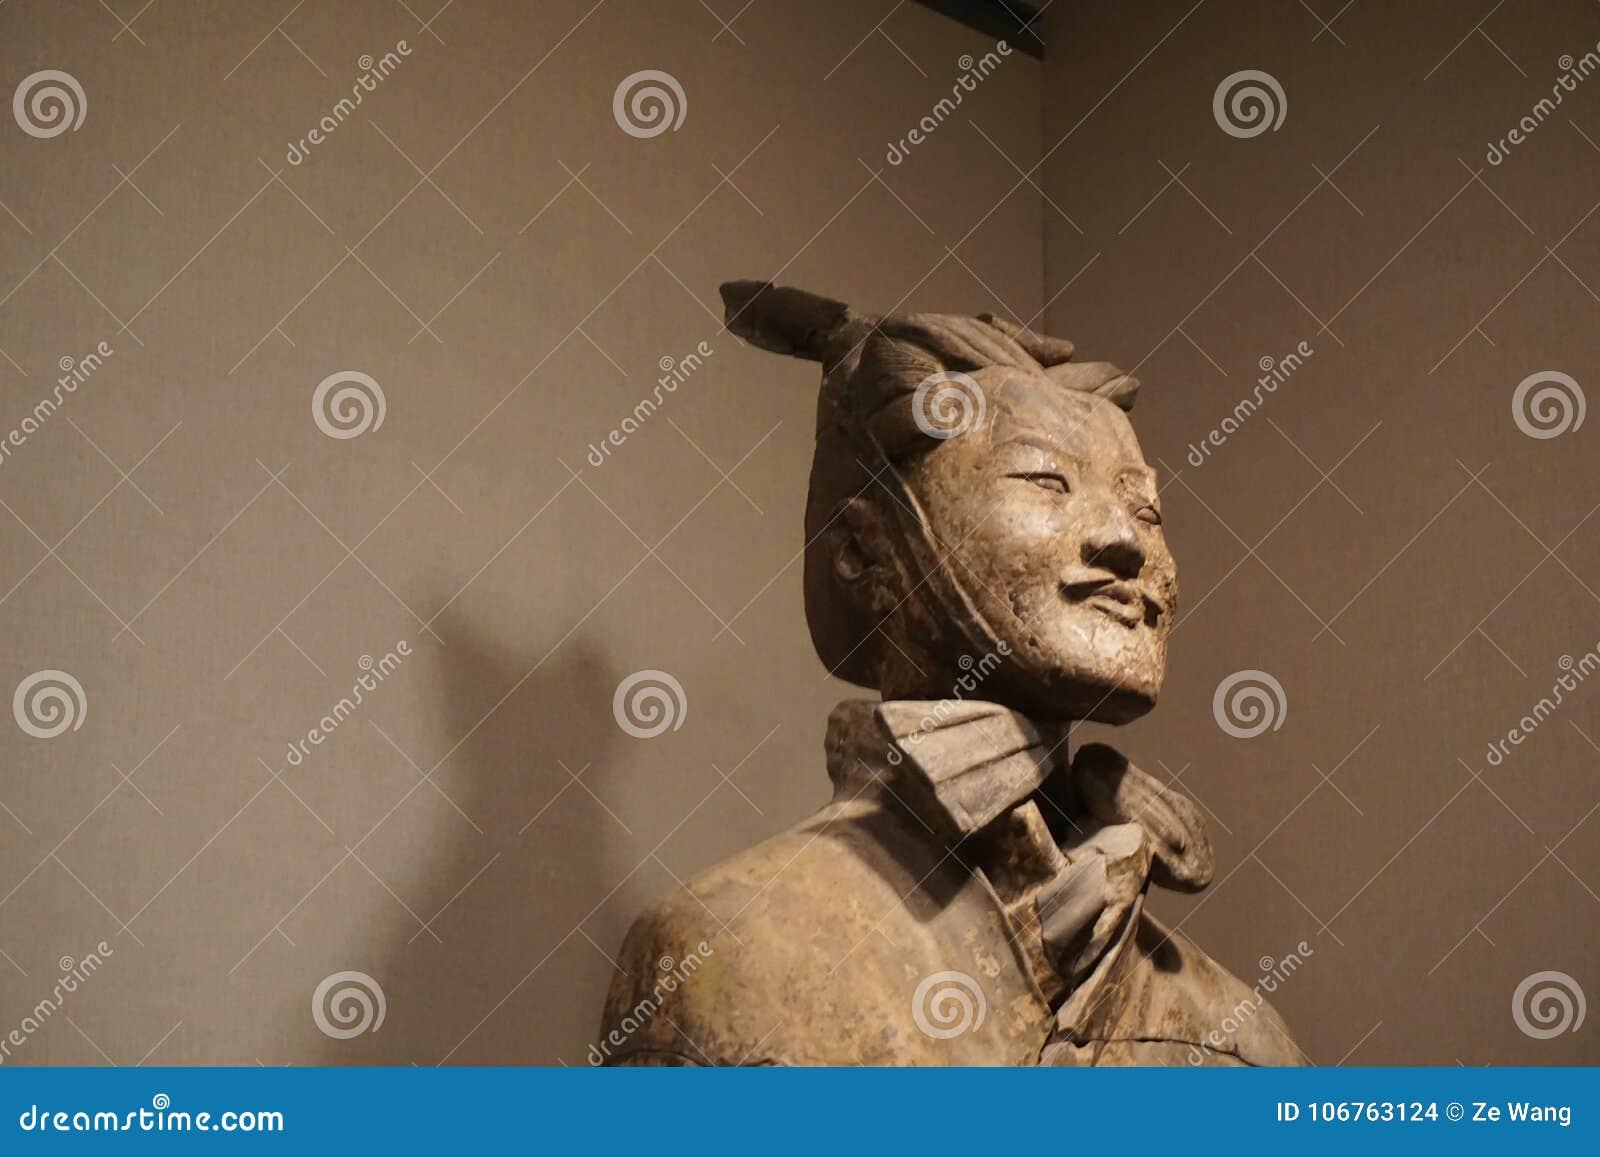 Shaanxi History Museum Terrocotta Soldier